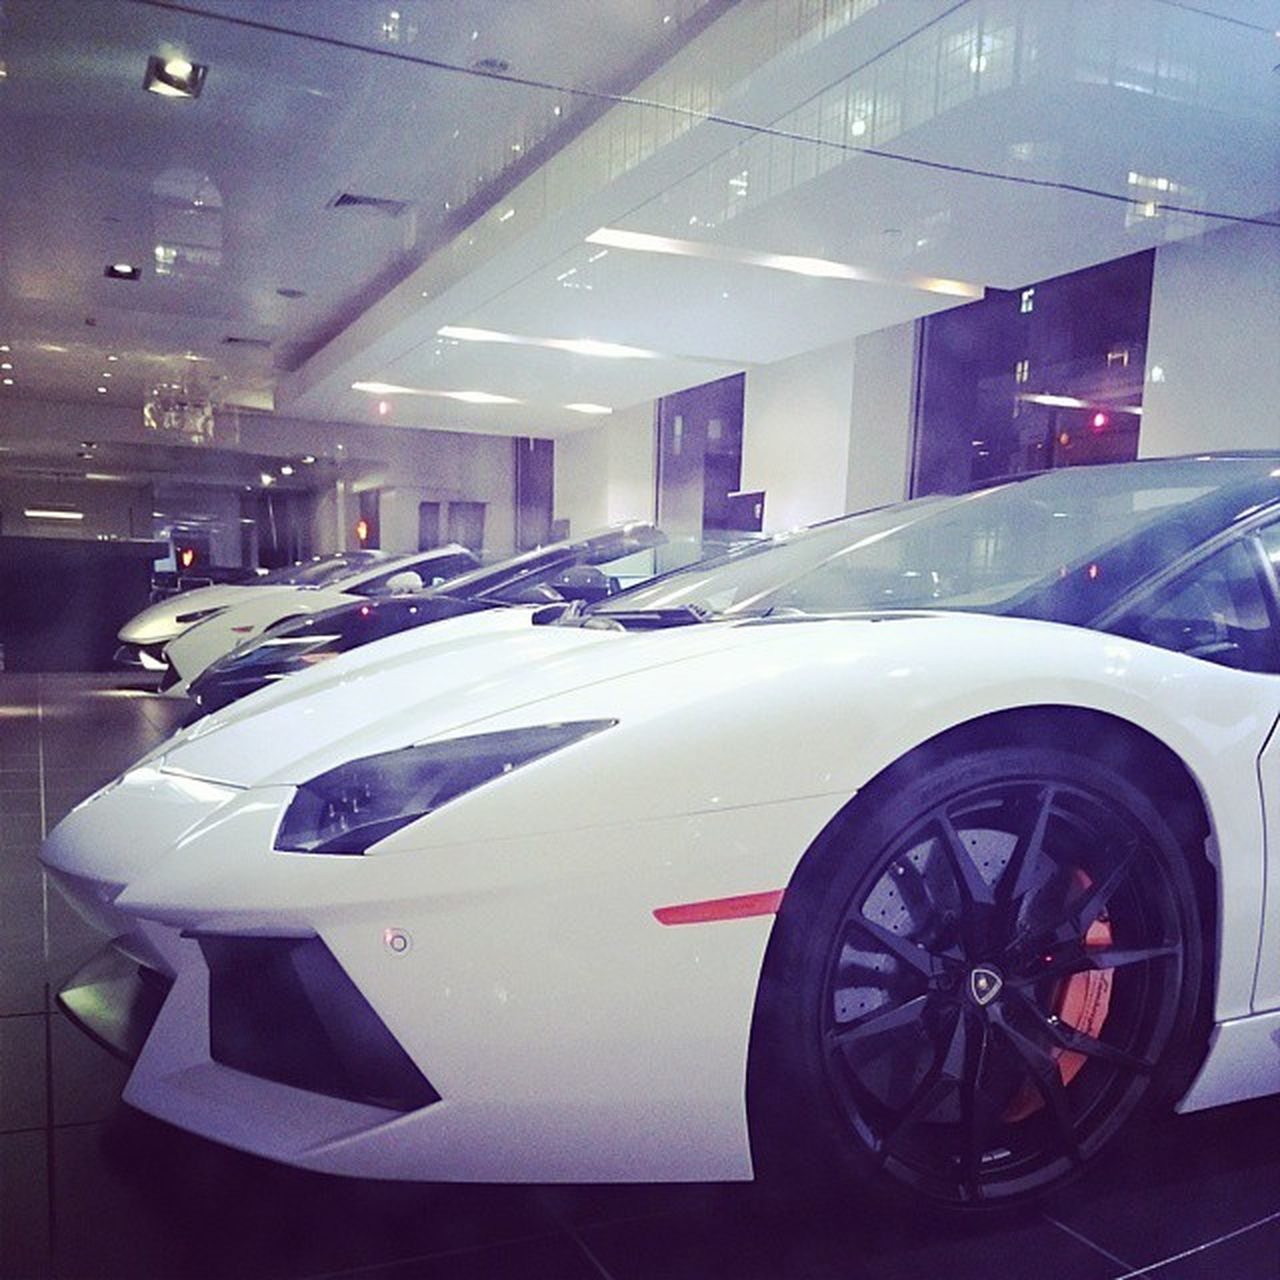 car, transportation, mode of transport, land vehicle, luxury, illuminated, stationary, indoors, no people, modern, technology, day